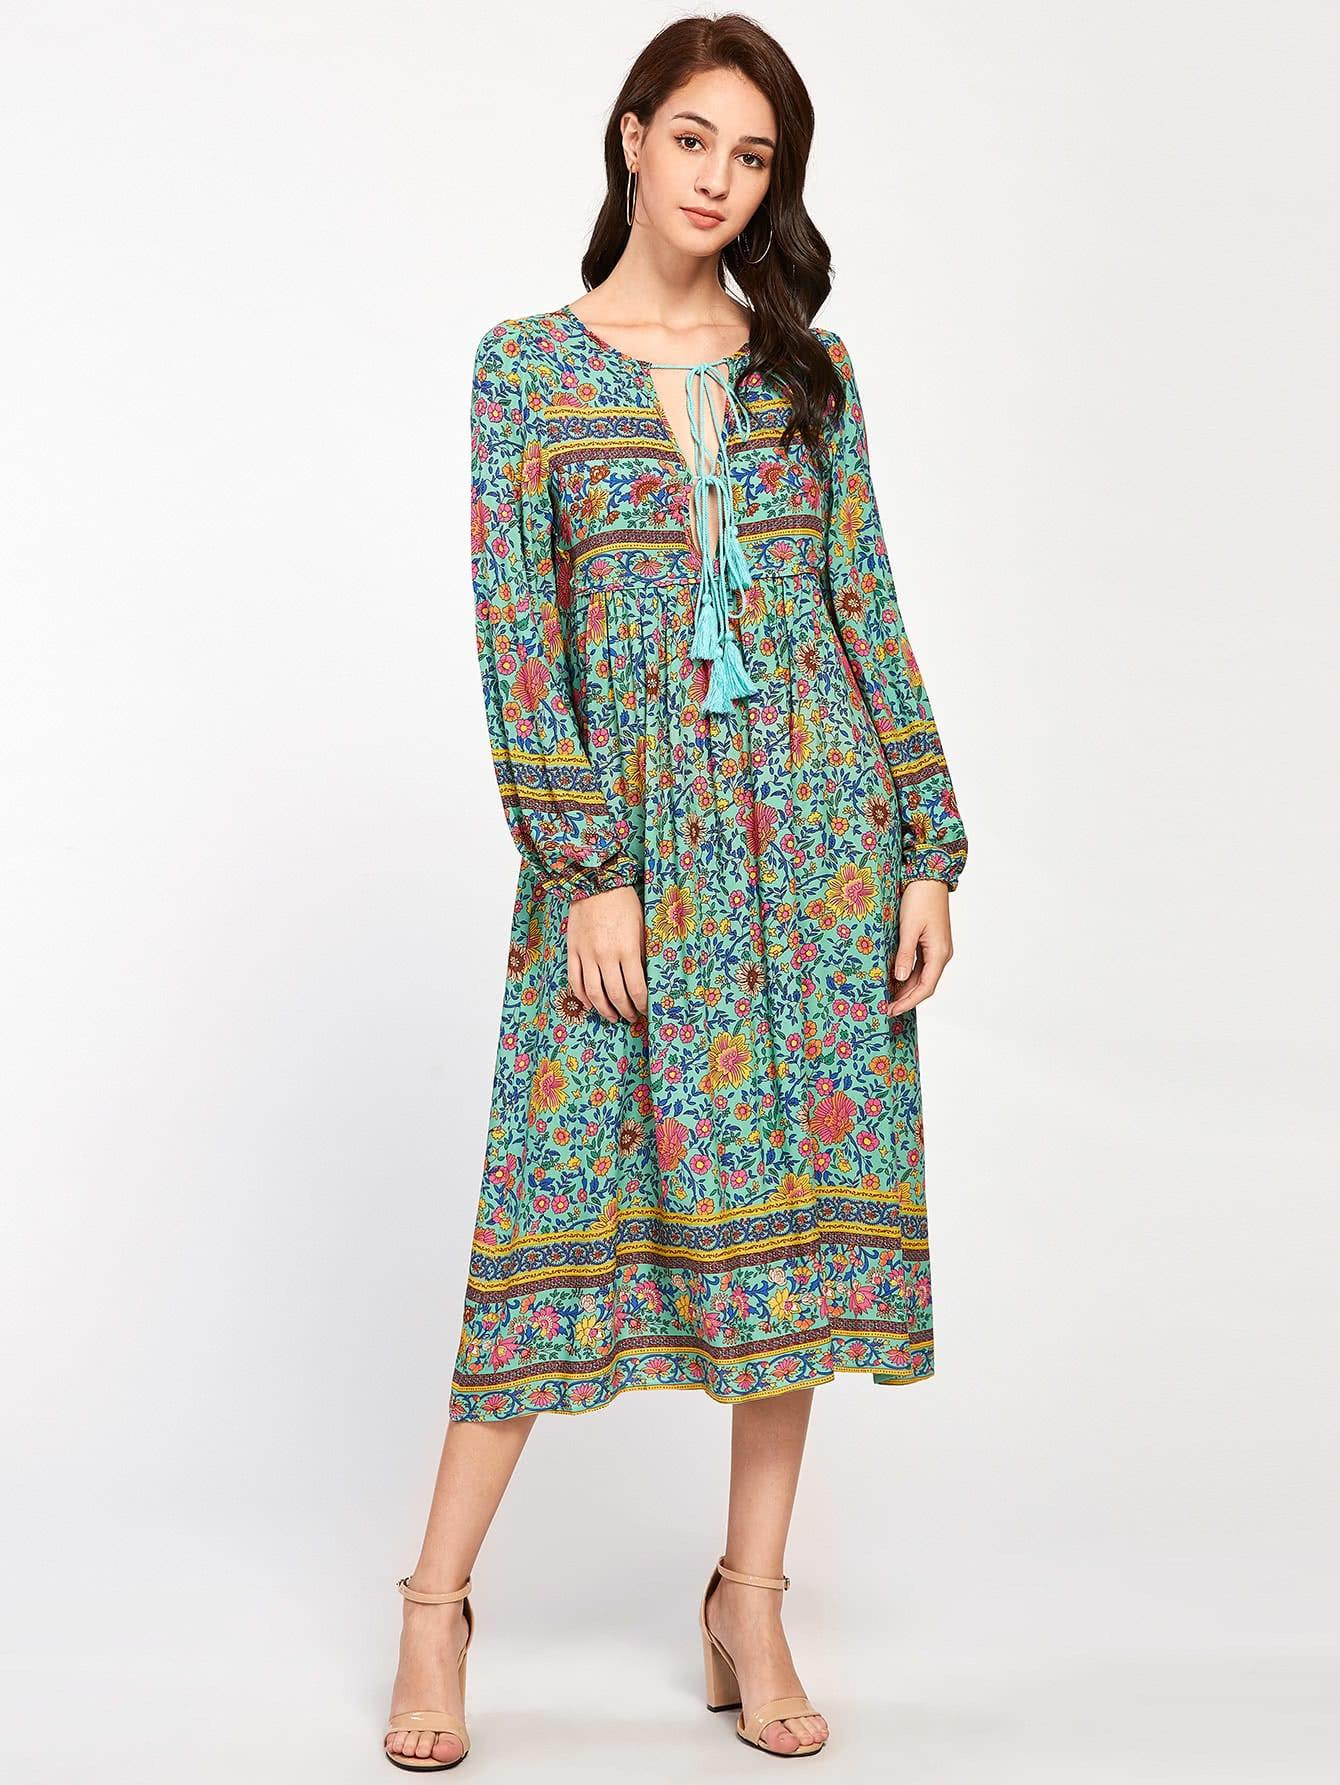 Lace Up V Neck Boho Dress With Tassel Shein Sheinside